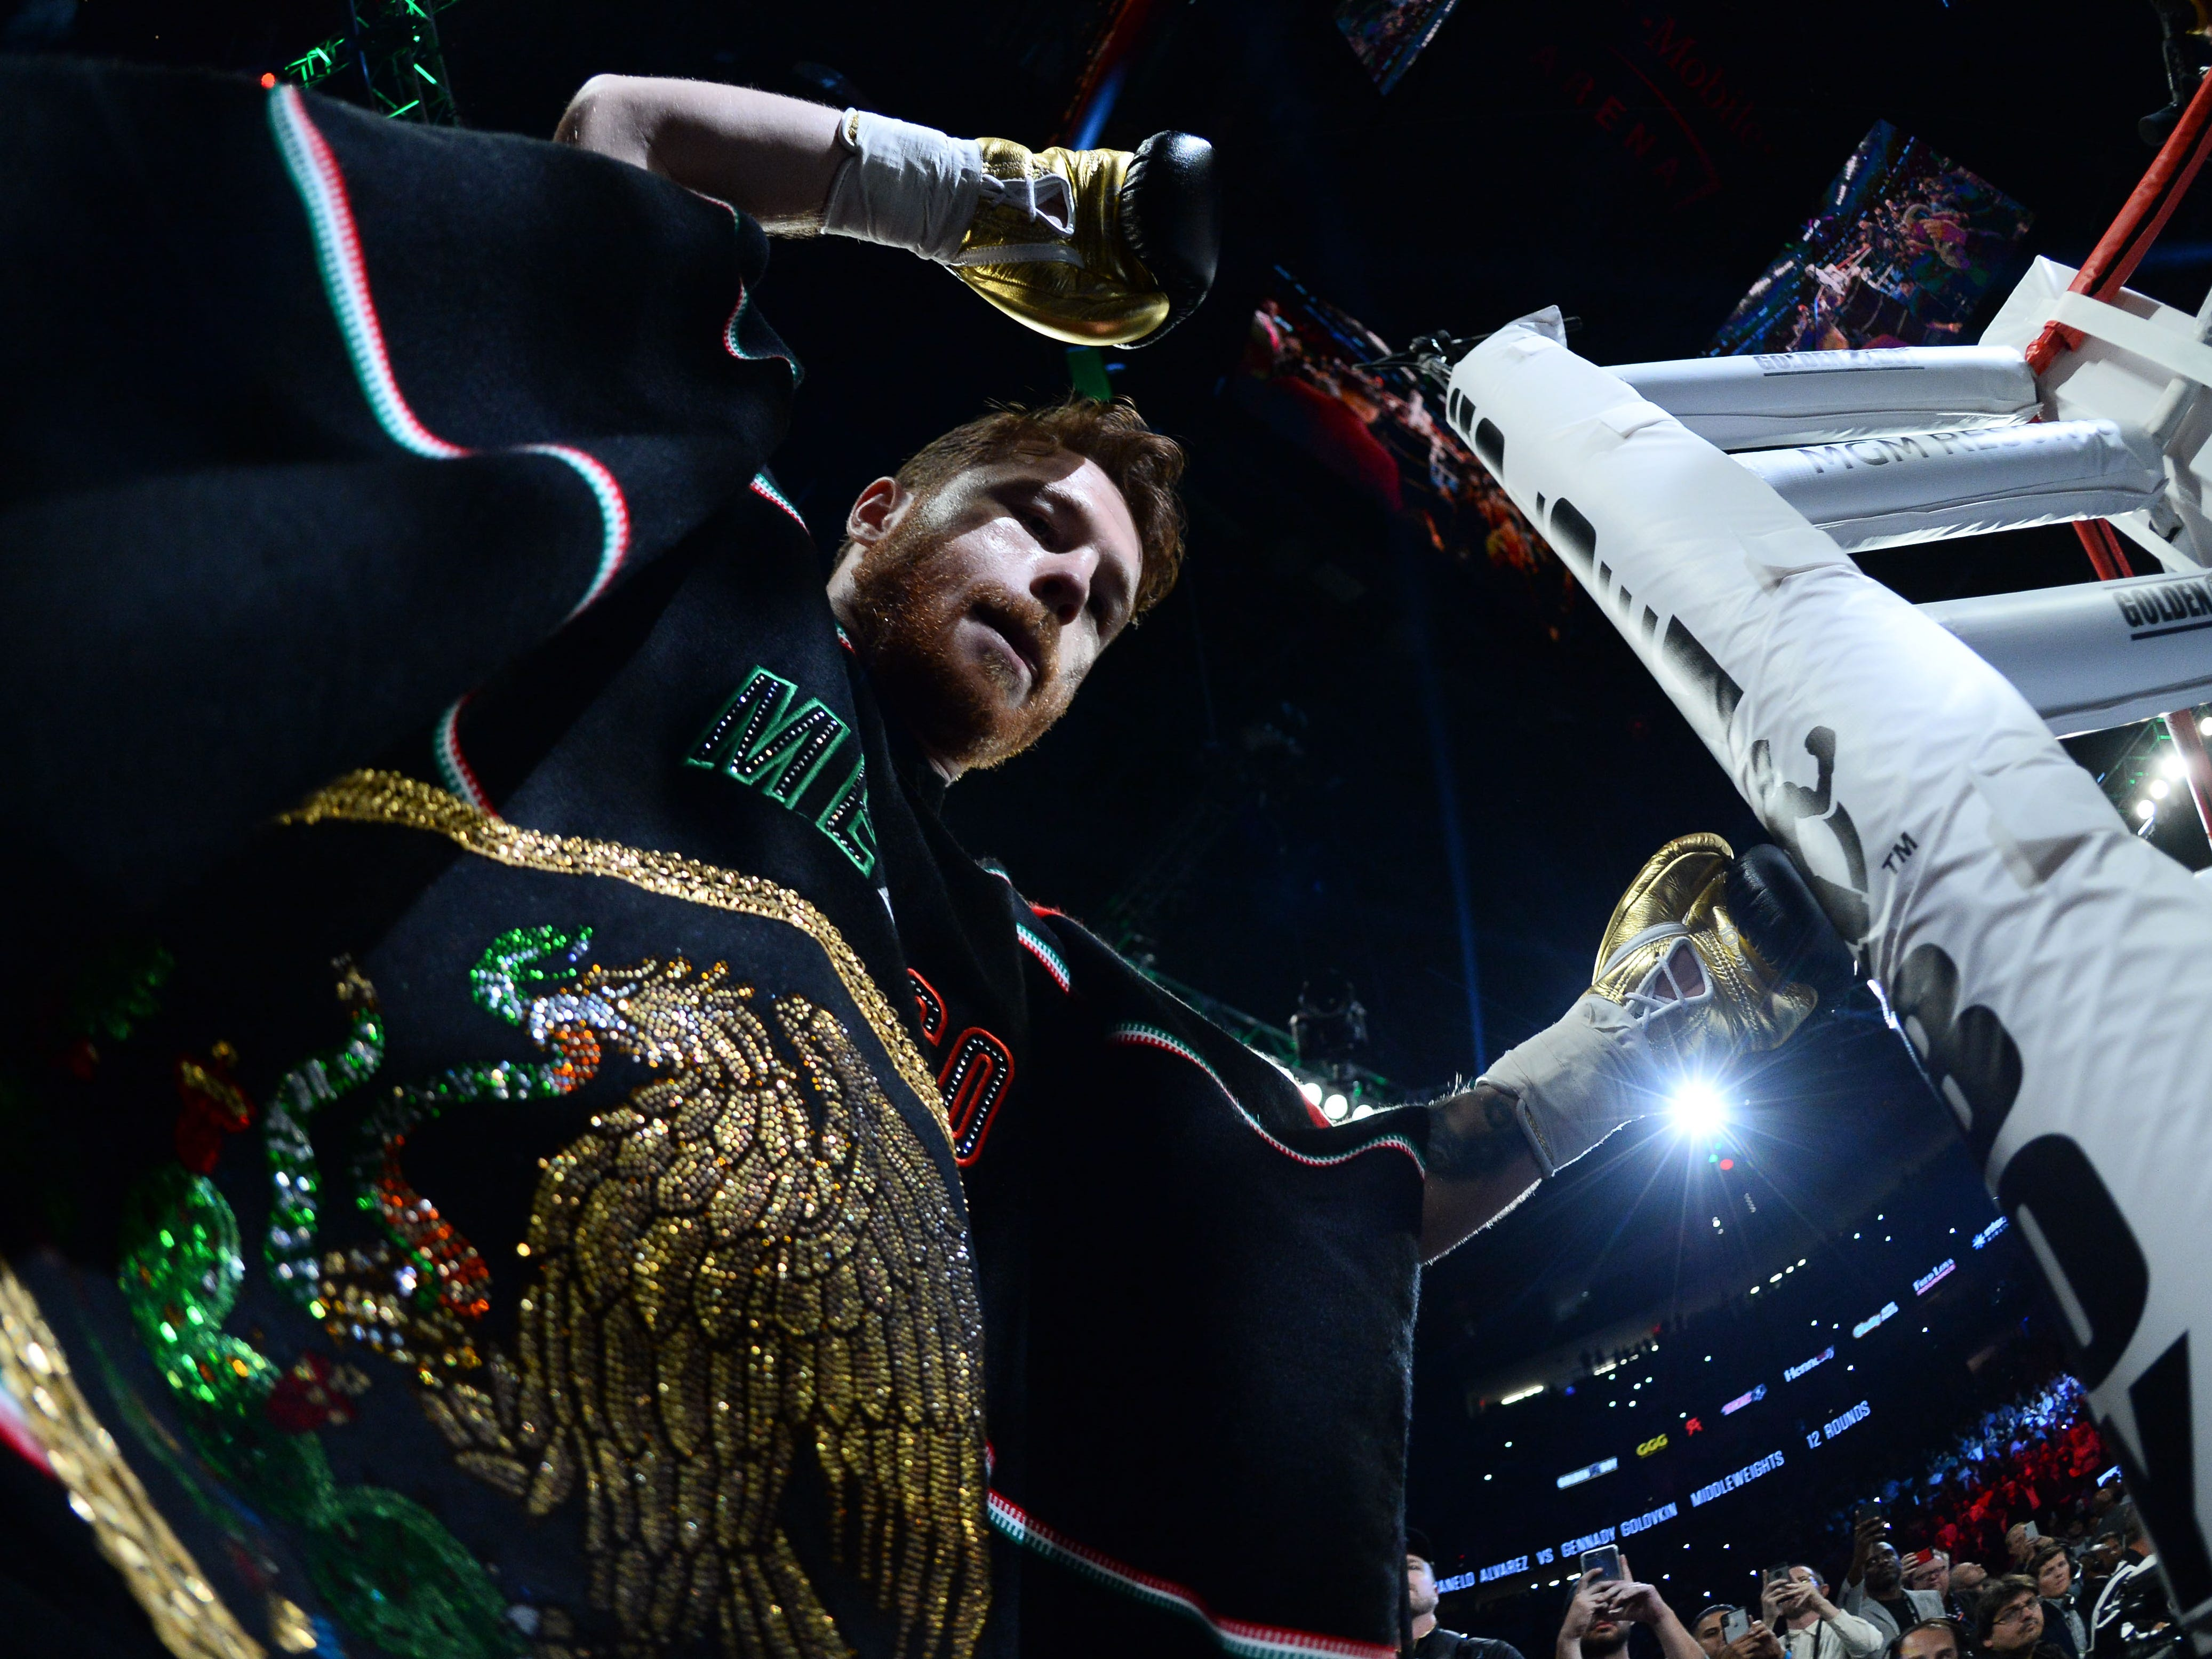 Alvarez enters the ring.